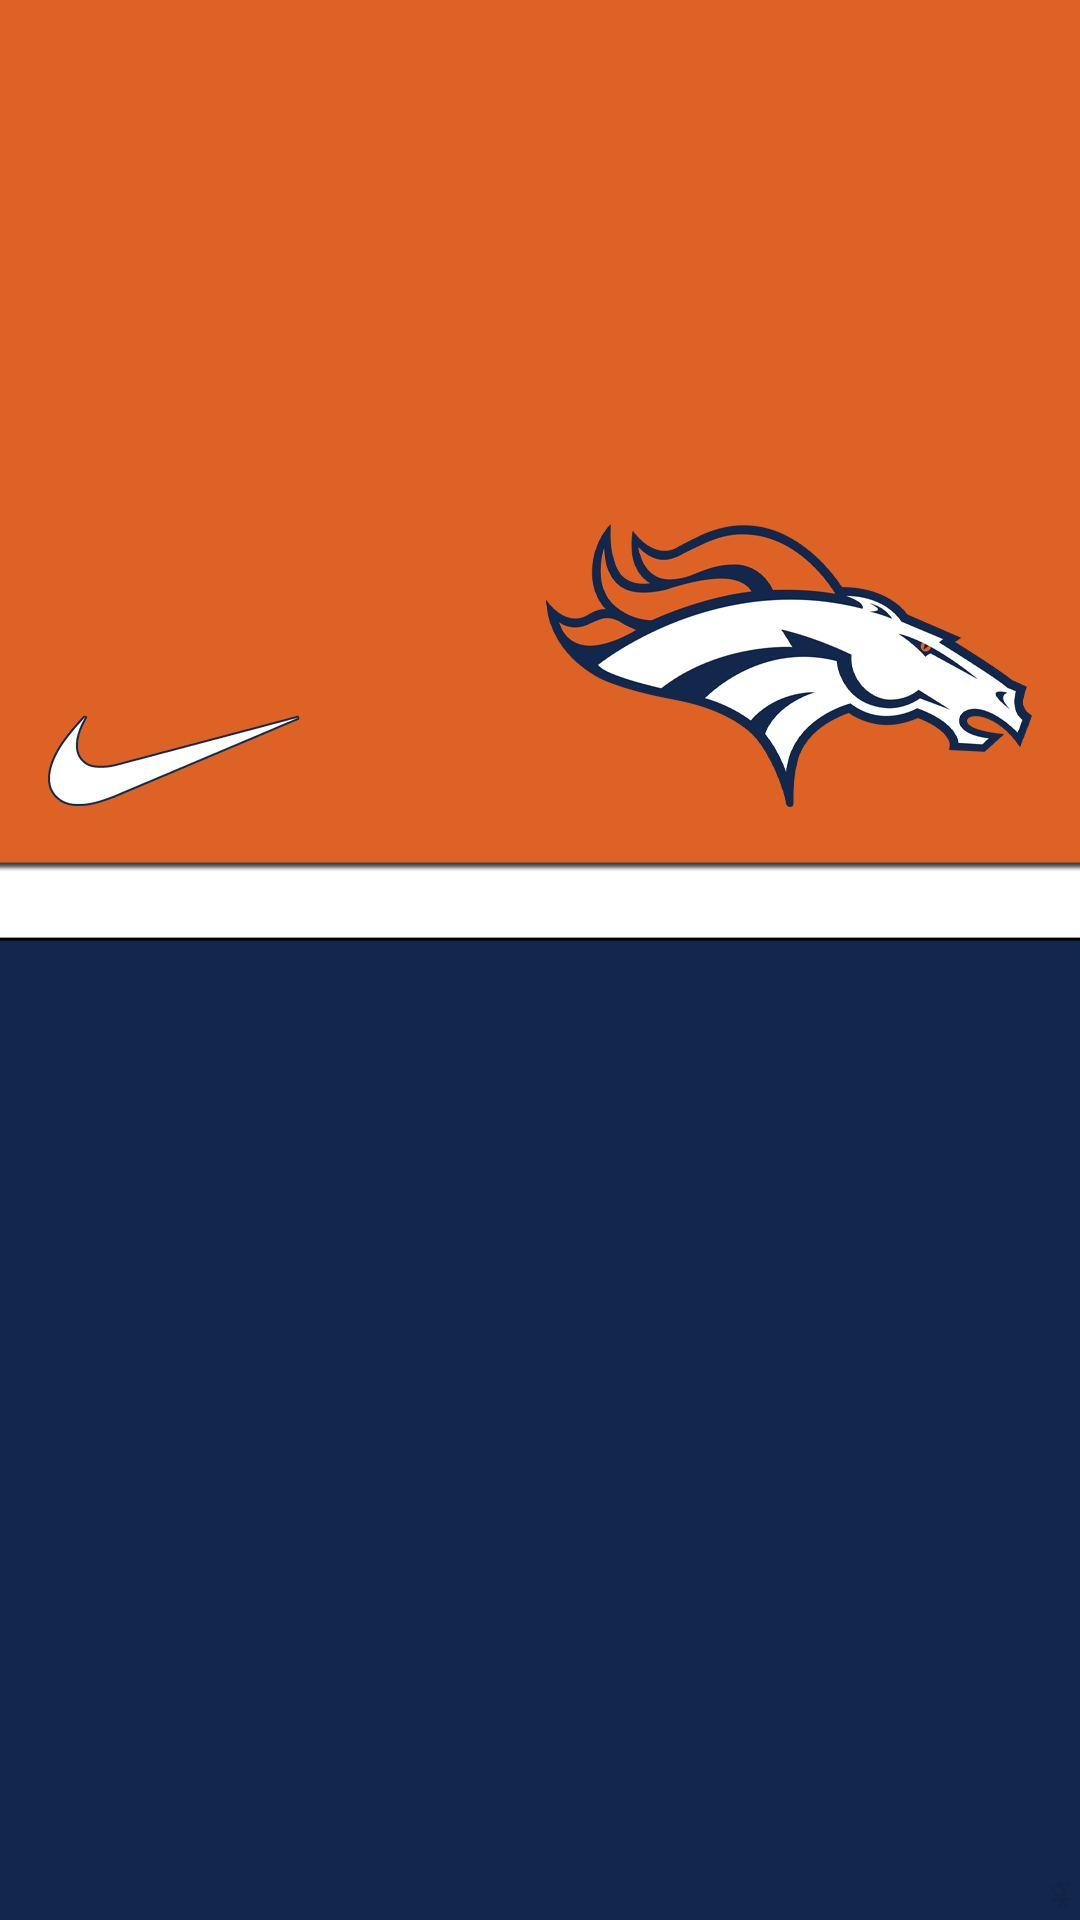 Denver Broncos 2018 Wallpapers - Wallpaper Cave